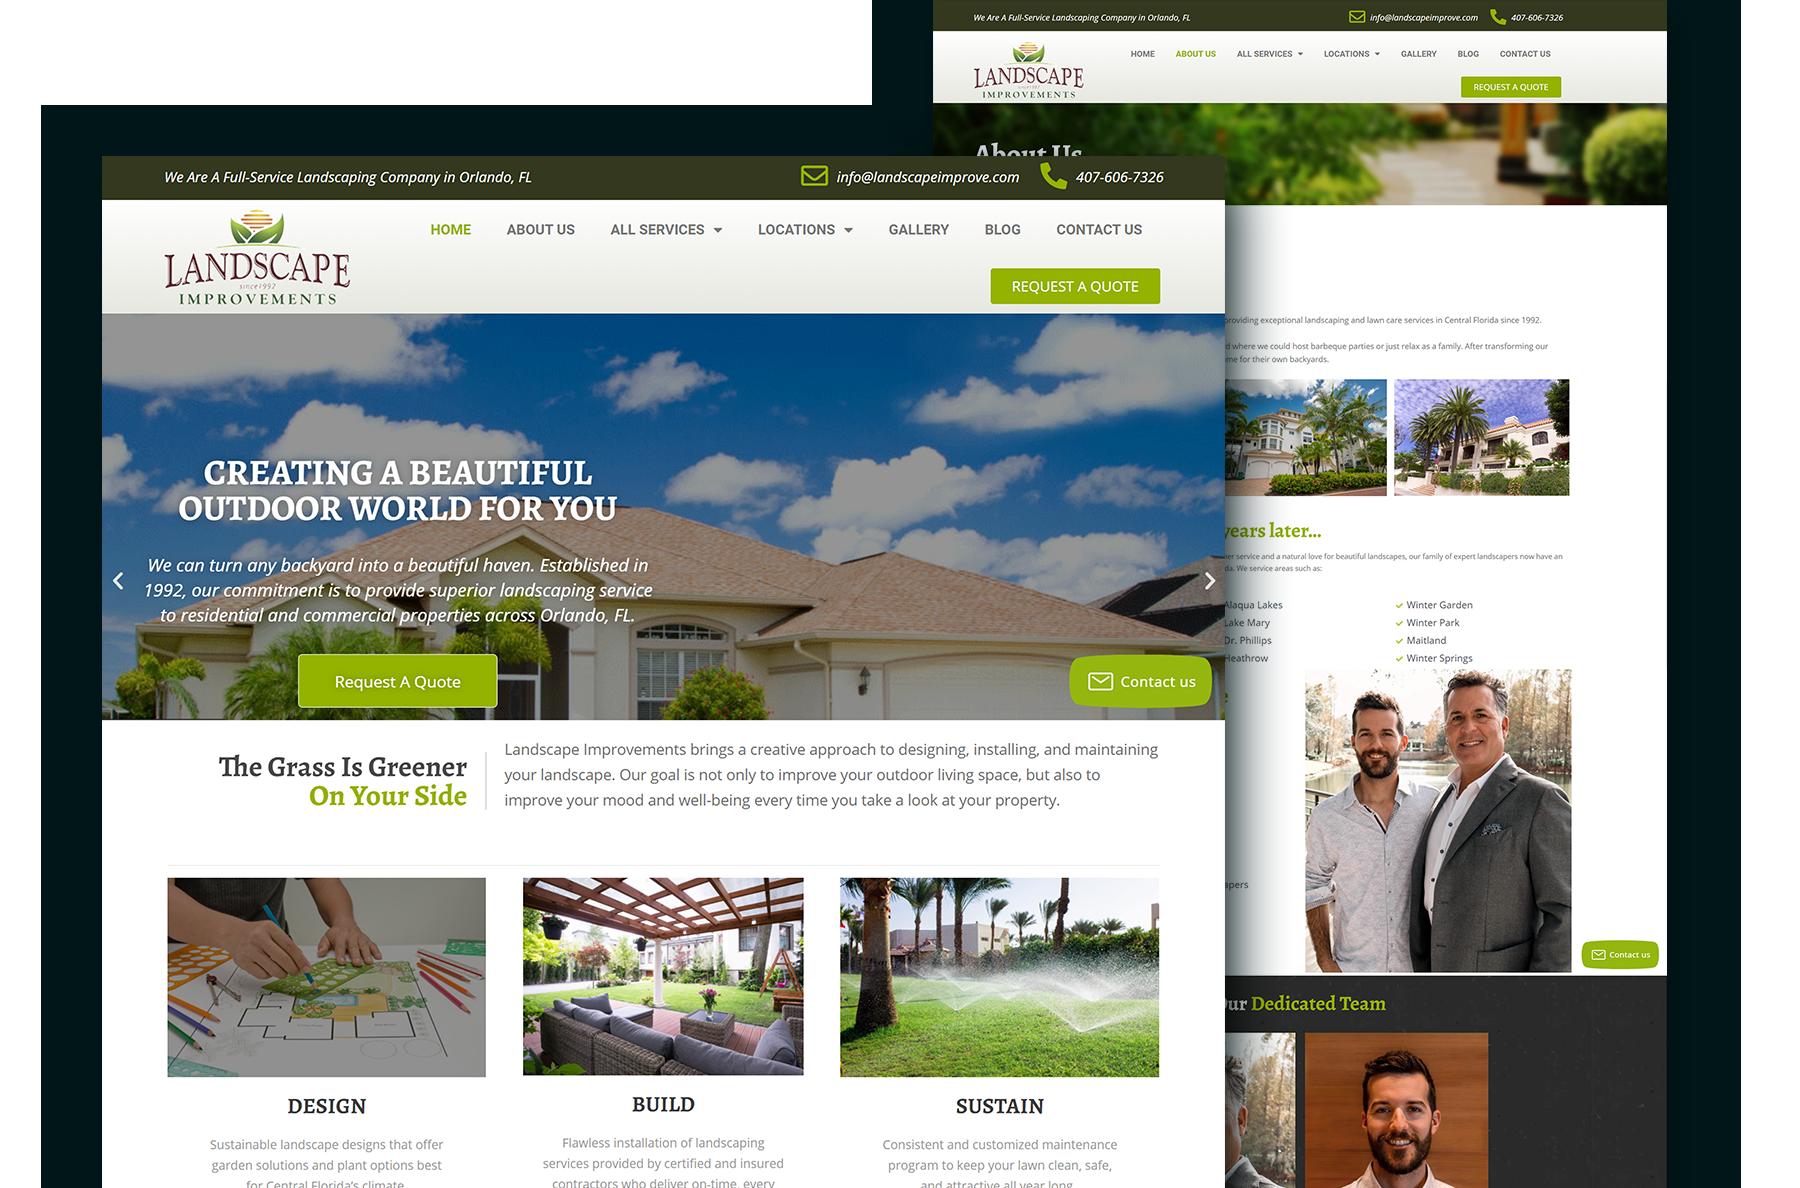 Web Design Company | Tulumi Digital Marketing